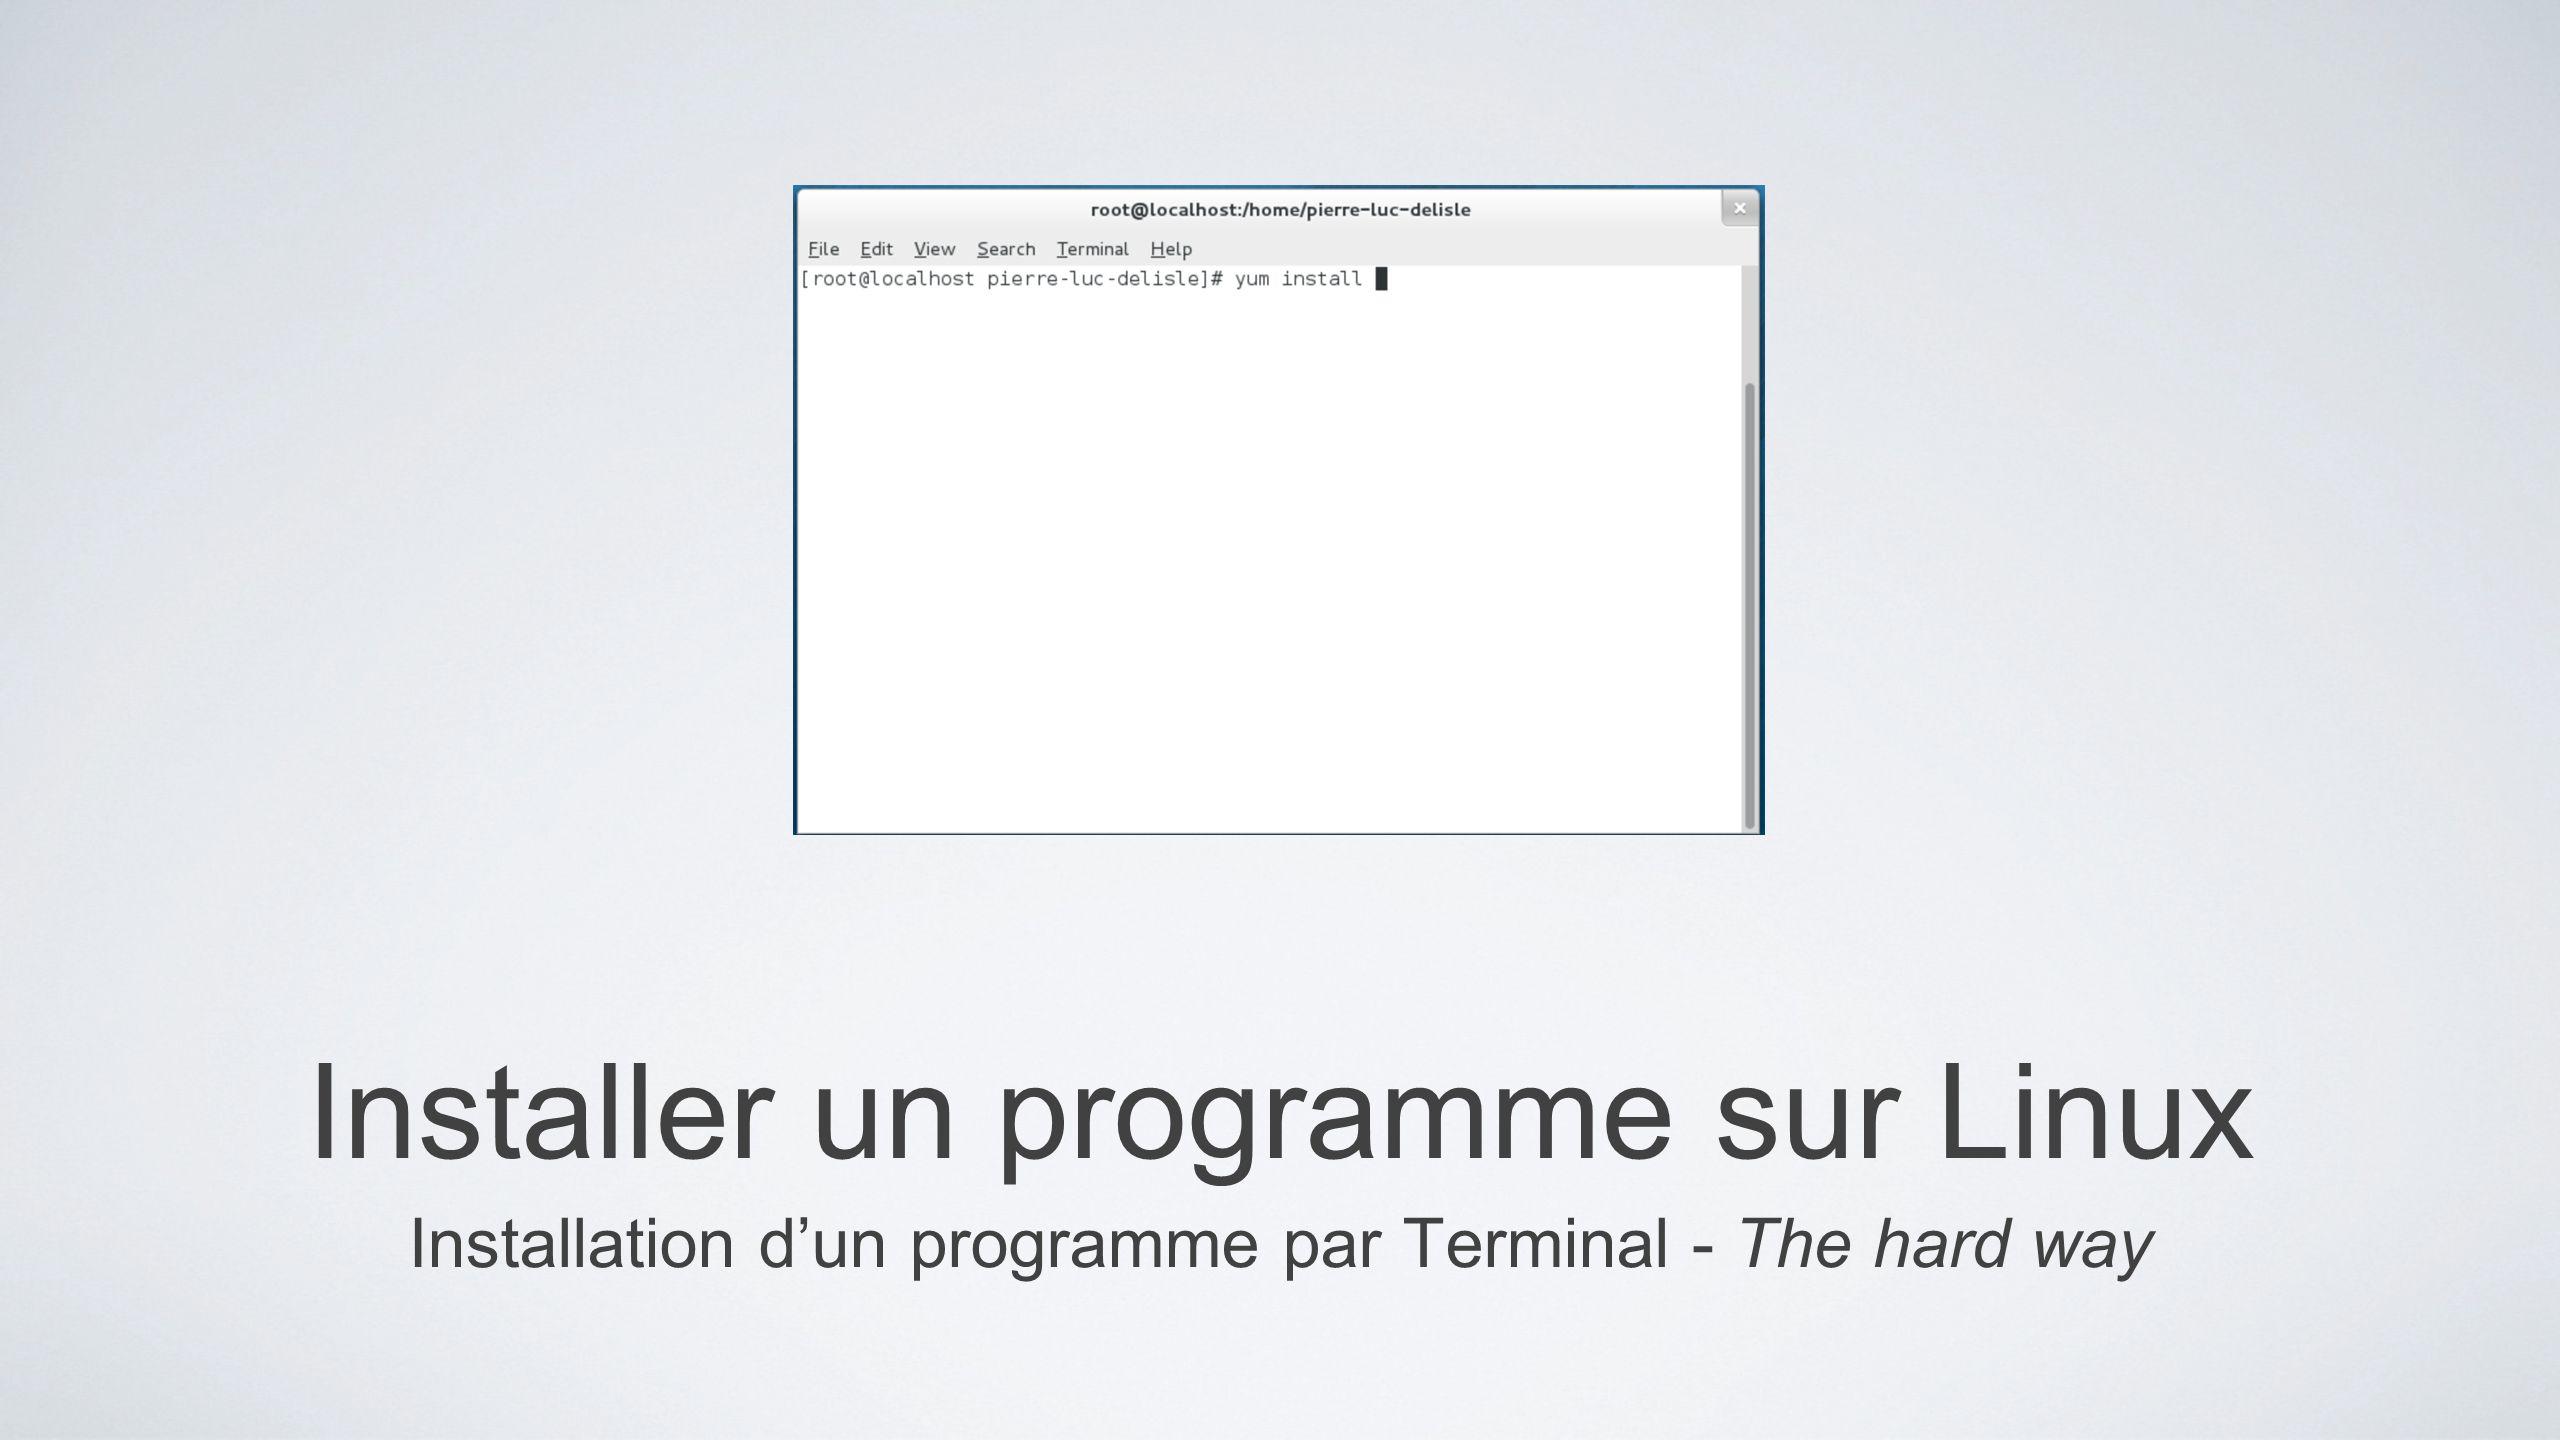 Installer un programme sur Linux Installation dun programme par Terminal - The hard way